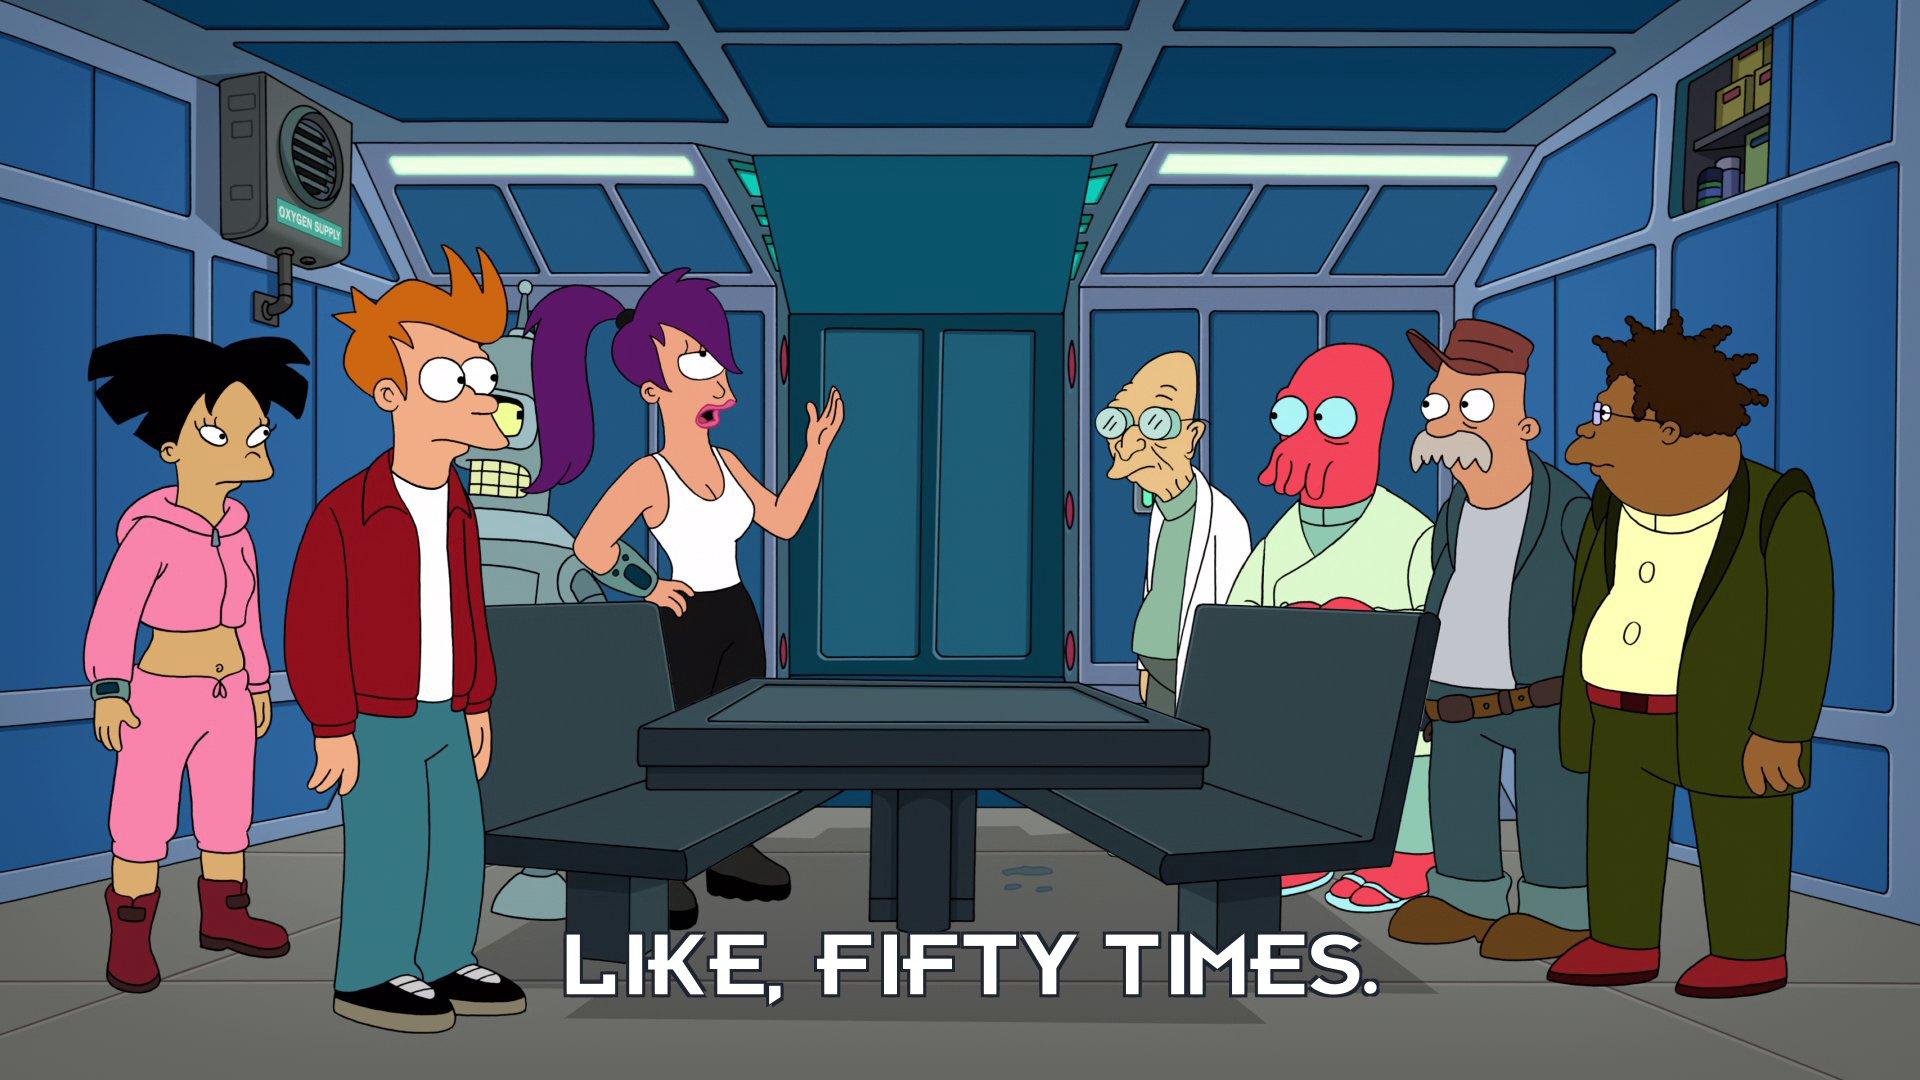 Turanga Leela: Like, fifty times.